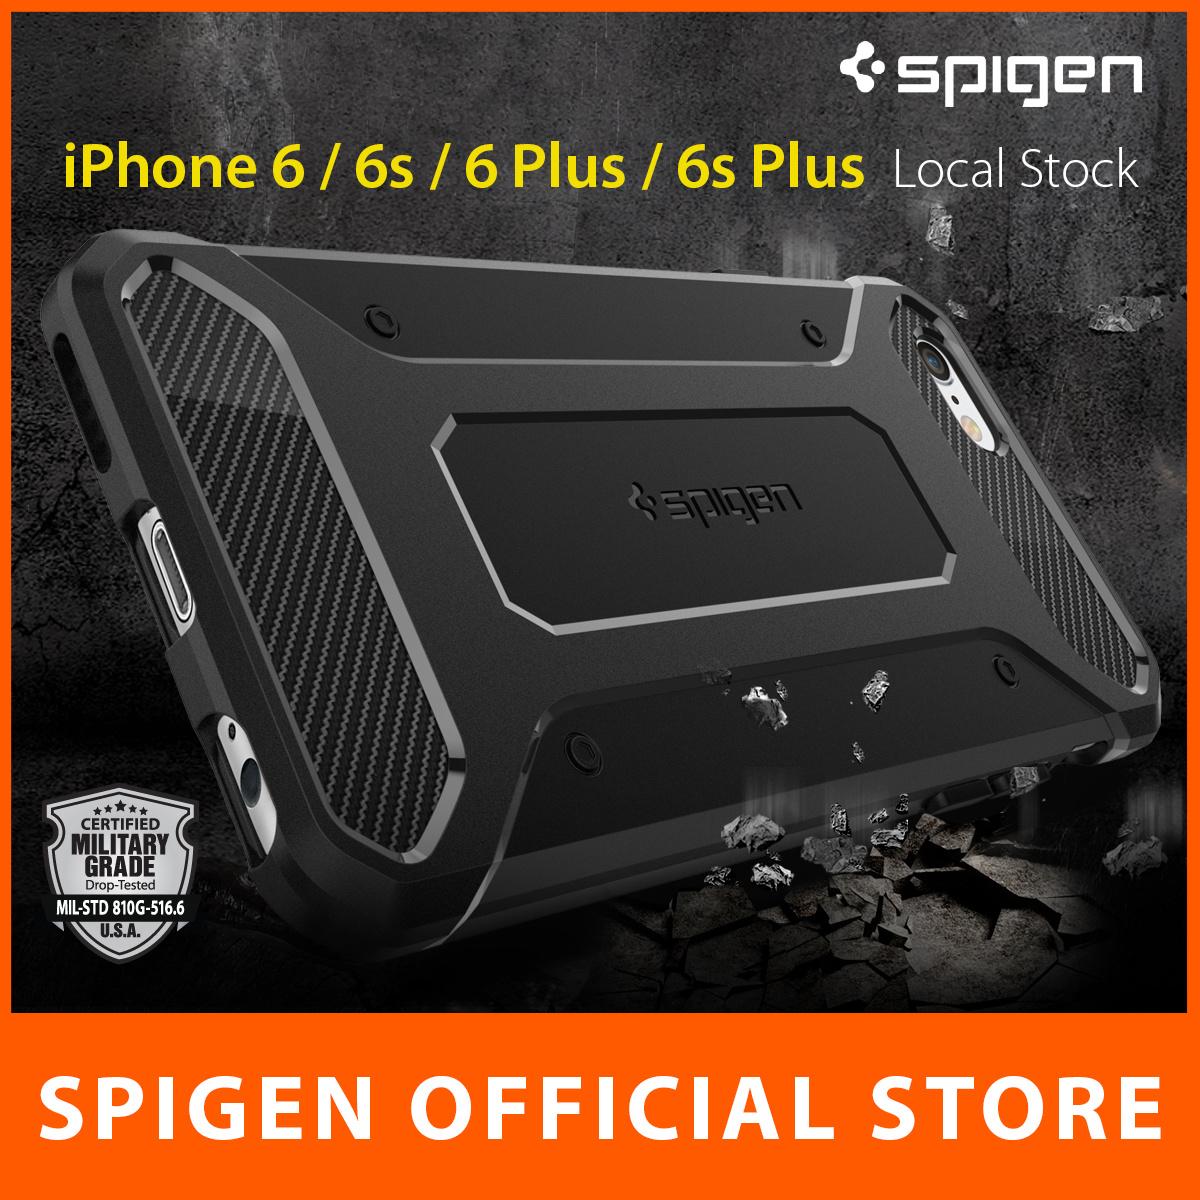 Harga Jual Spigen Iphone 7 Plus Case Hybrid Armor Original Casing 3second Tshirt 166031812kn Kuning S Qoo10 6s Mobile Accessories Champagne Gold Show